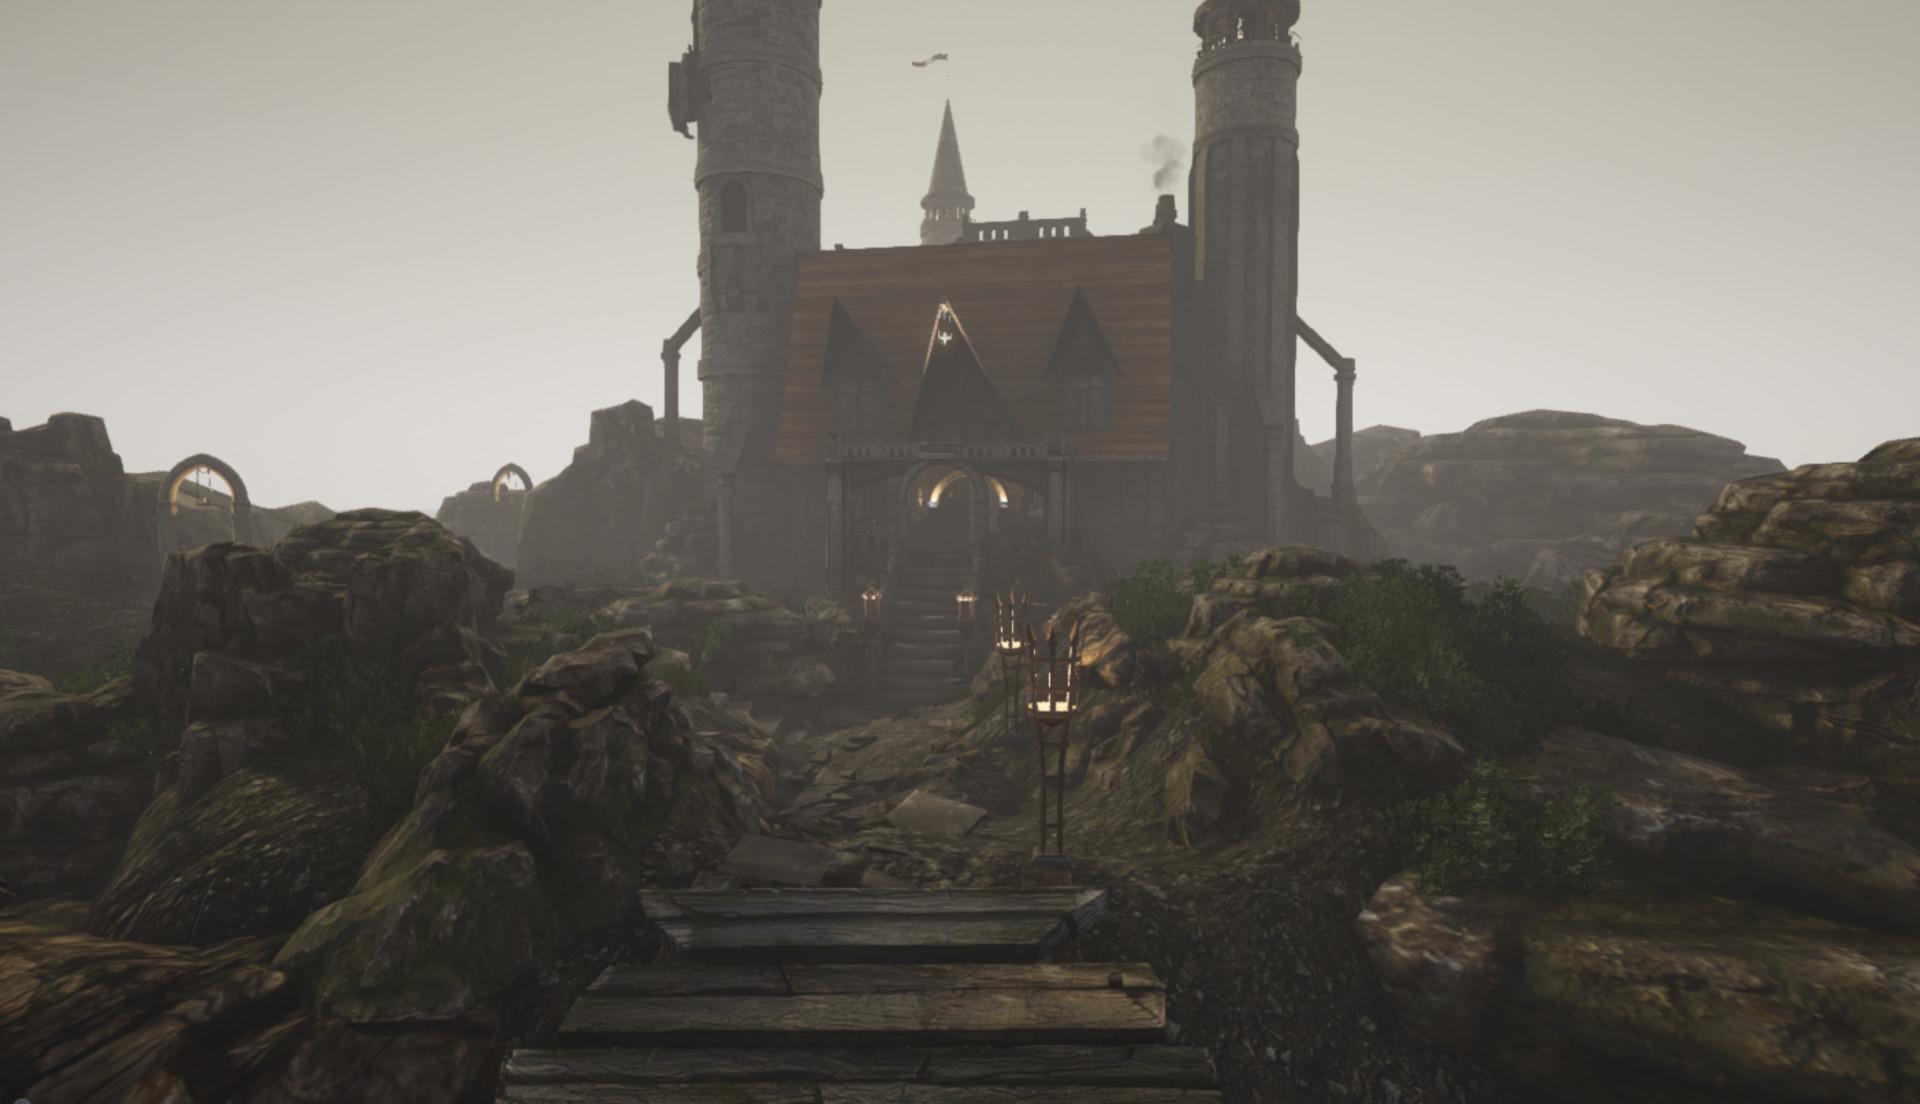 P h t doyle castletowerlighthouse 3